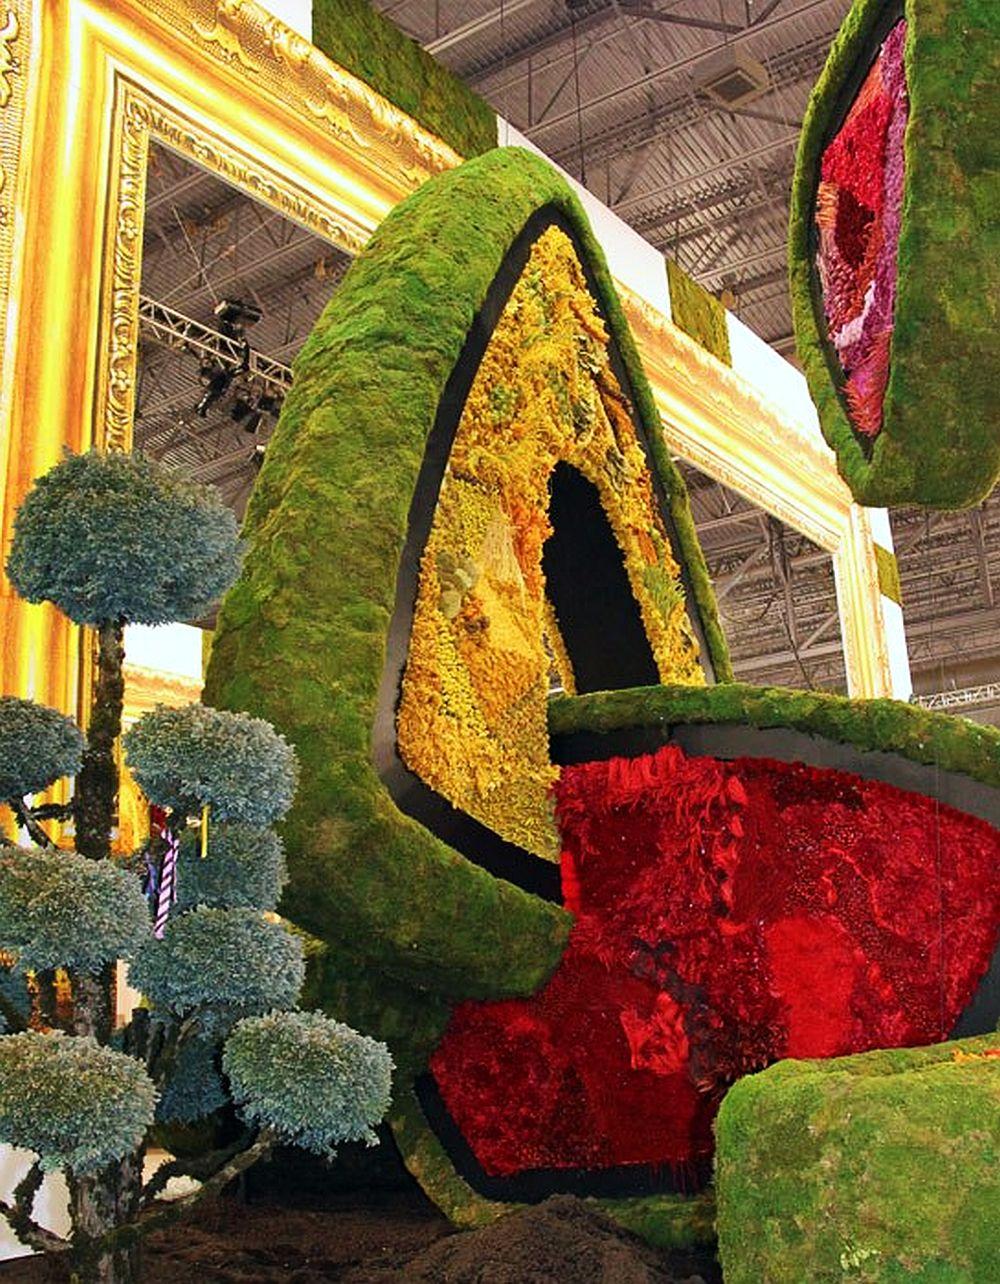 Super Eveniment Art I Horticultur La Cea Mai Mare Expozi Ie Floral Din Lume Adela P Rvu